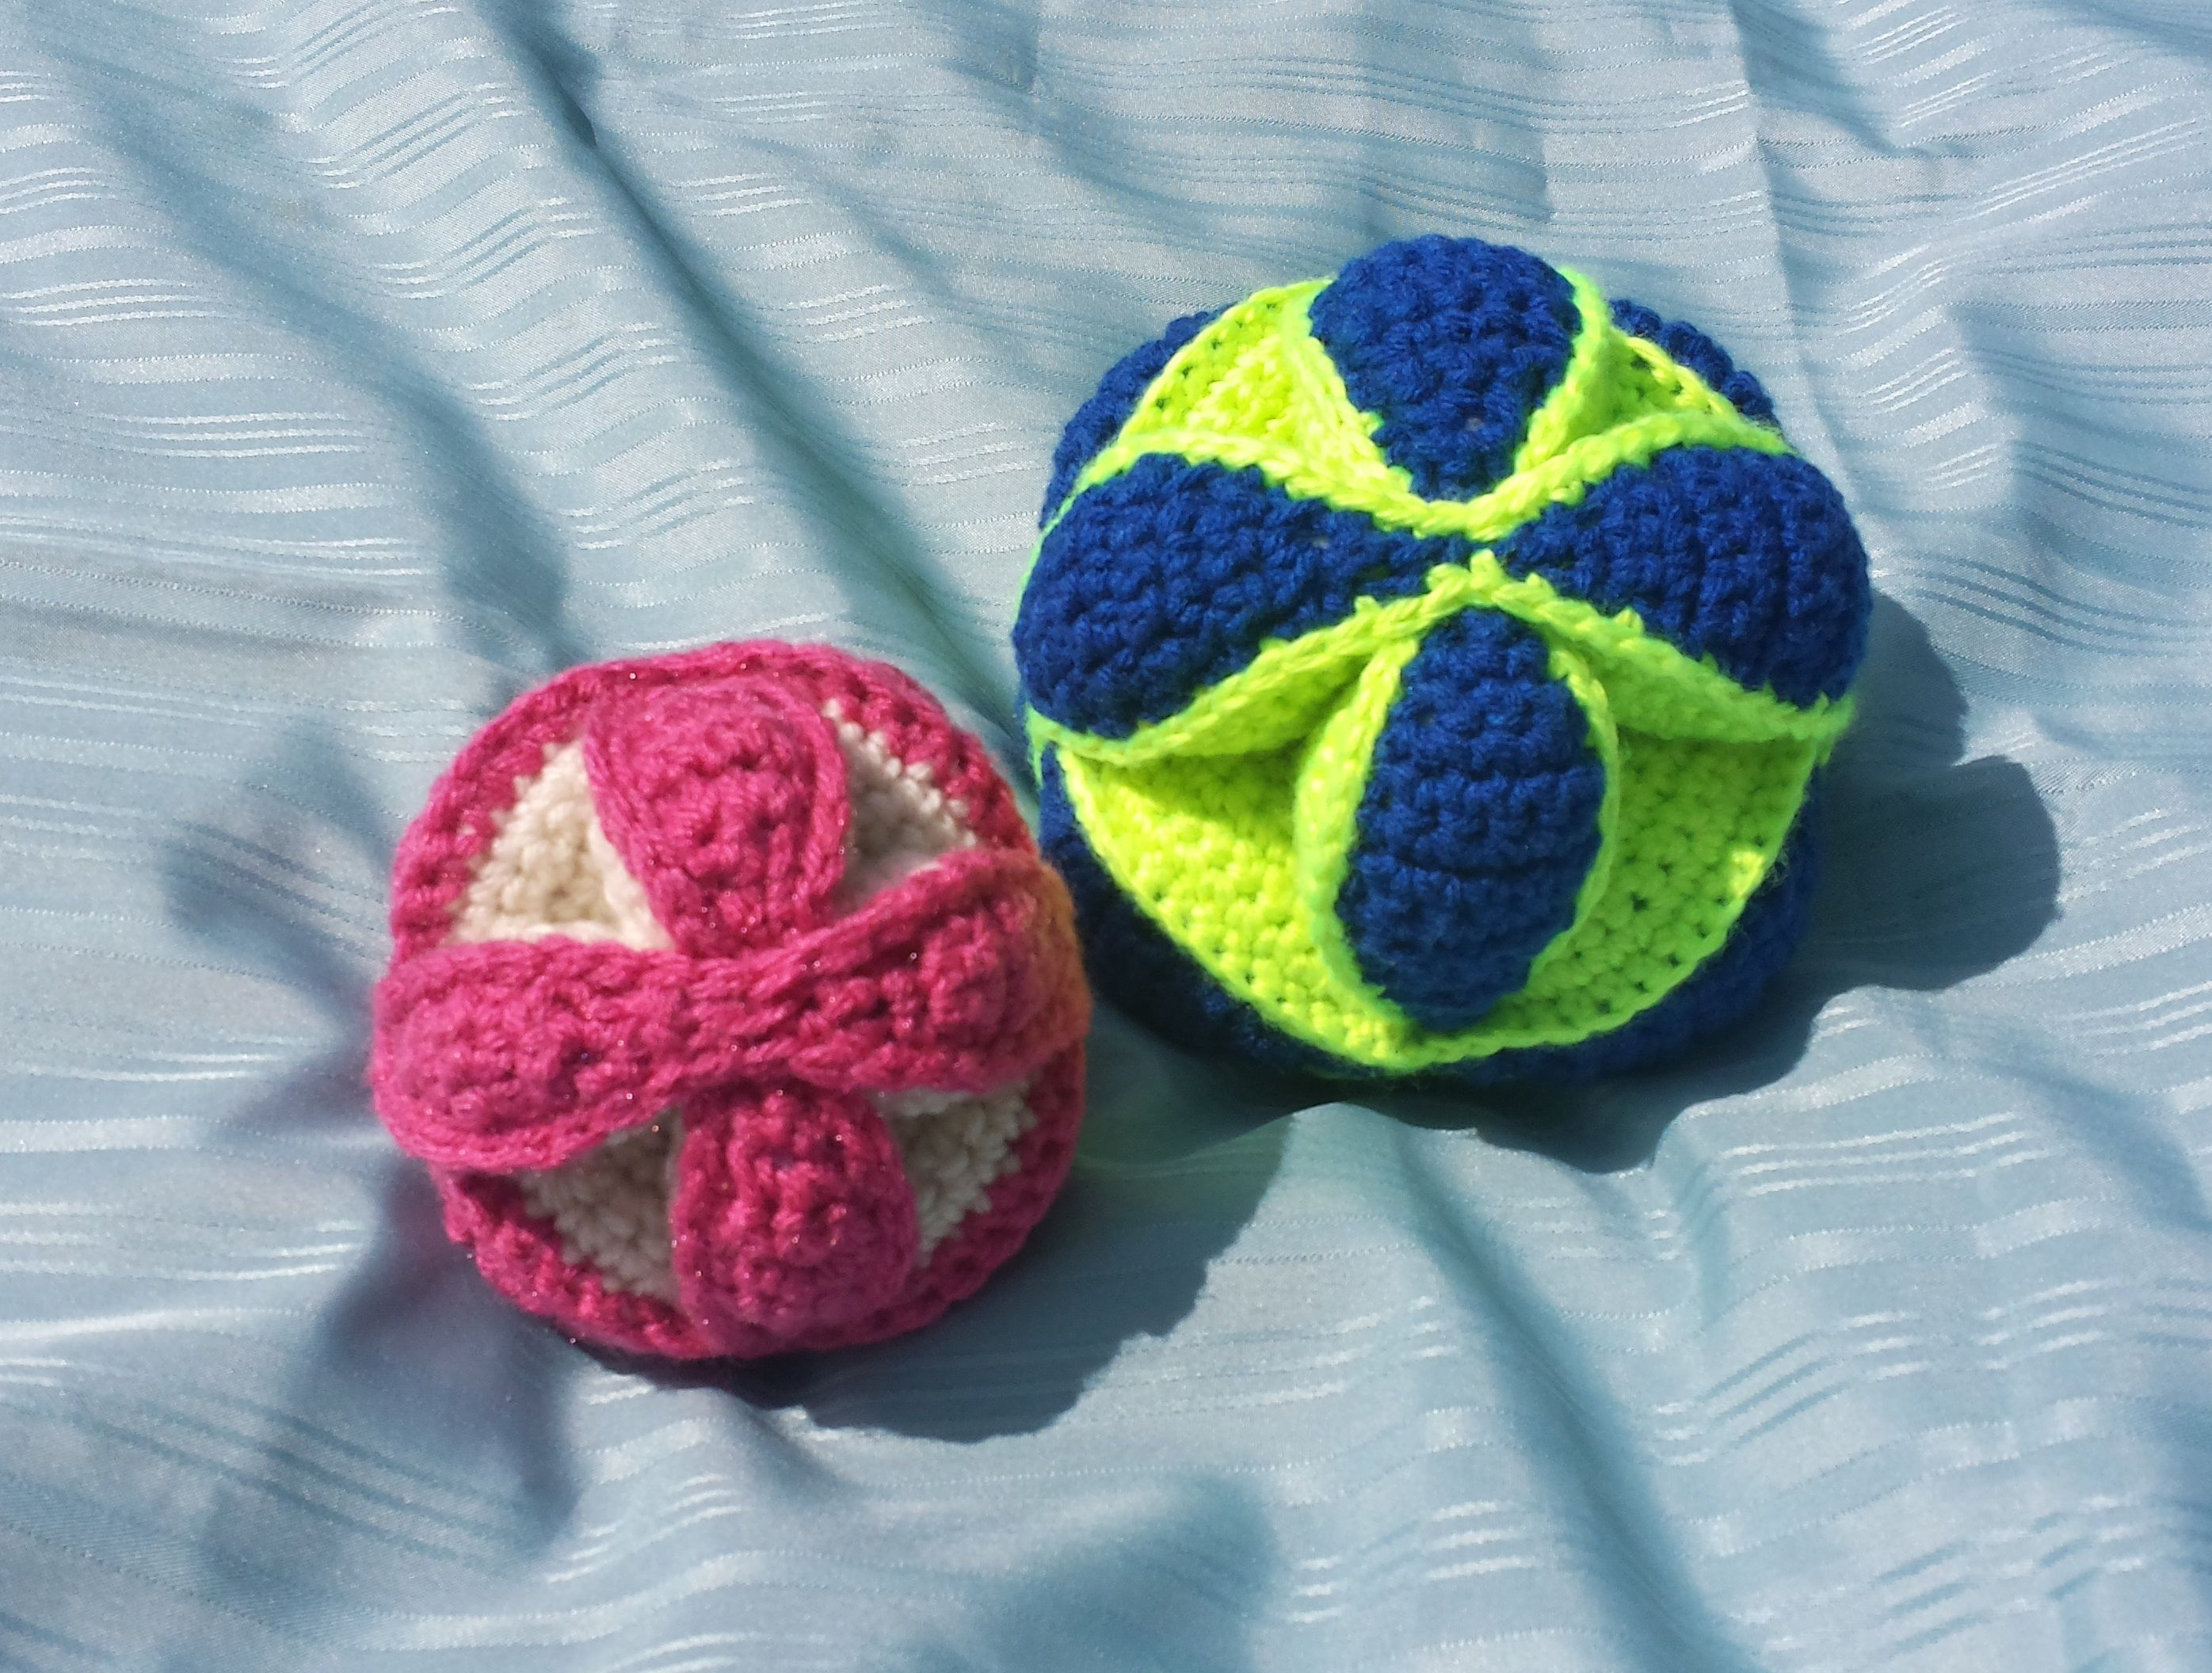 Amish Puzzle Balls, 2 sizes | Crochet Patterns | Pinterest